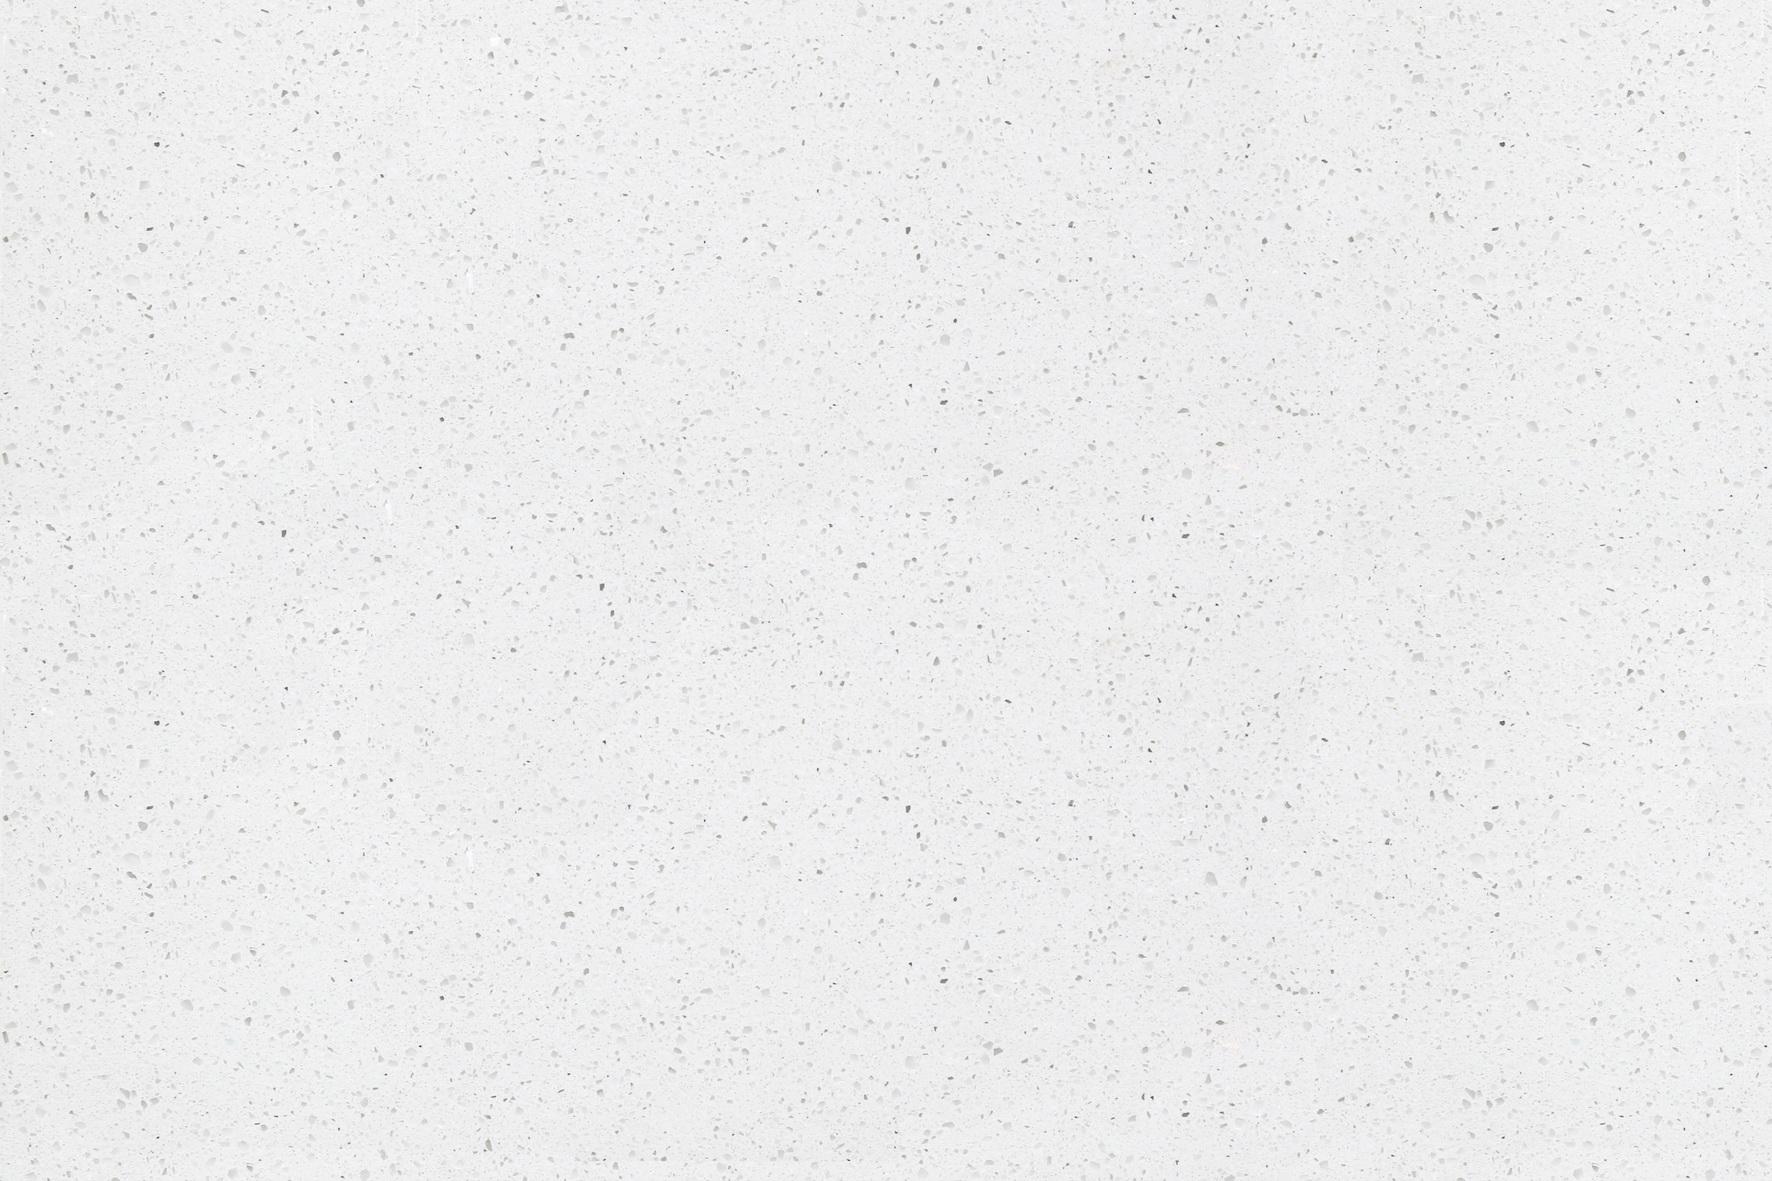 RAINBOW WHITE UNIPLUS UNIPLUS LUCIDE Foto: 1_44982_37638.jpg